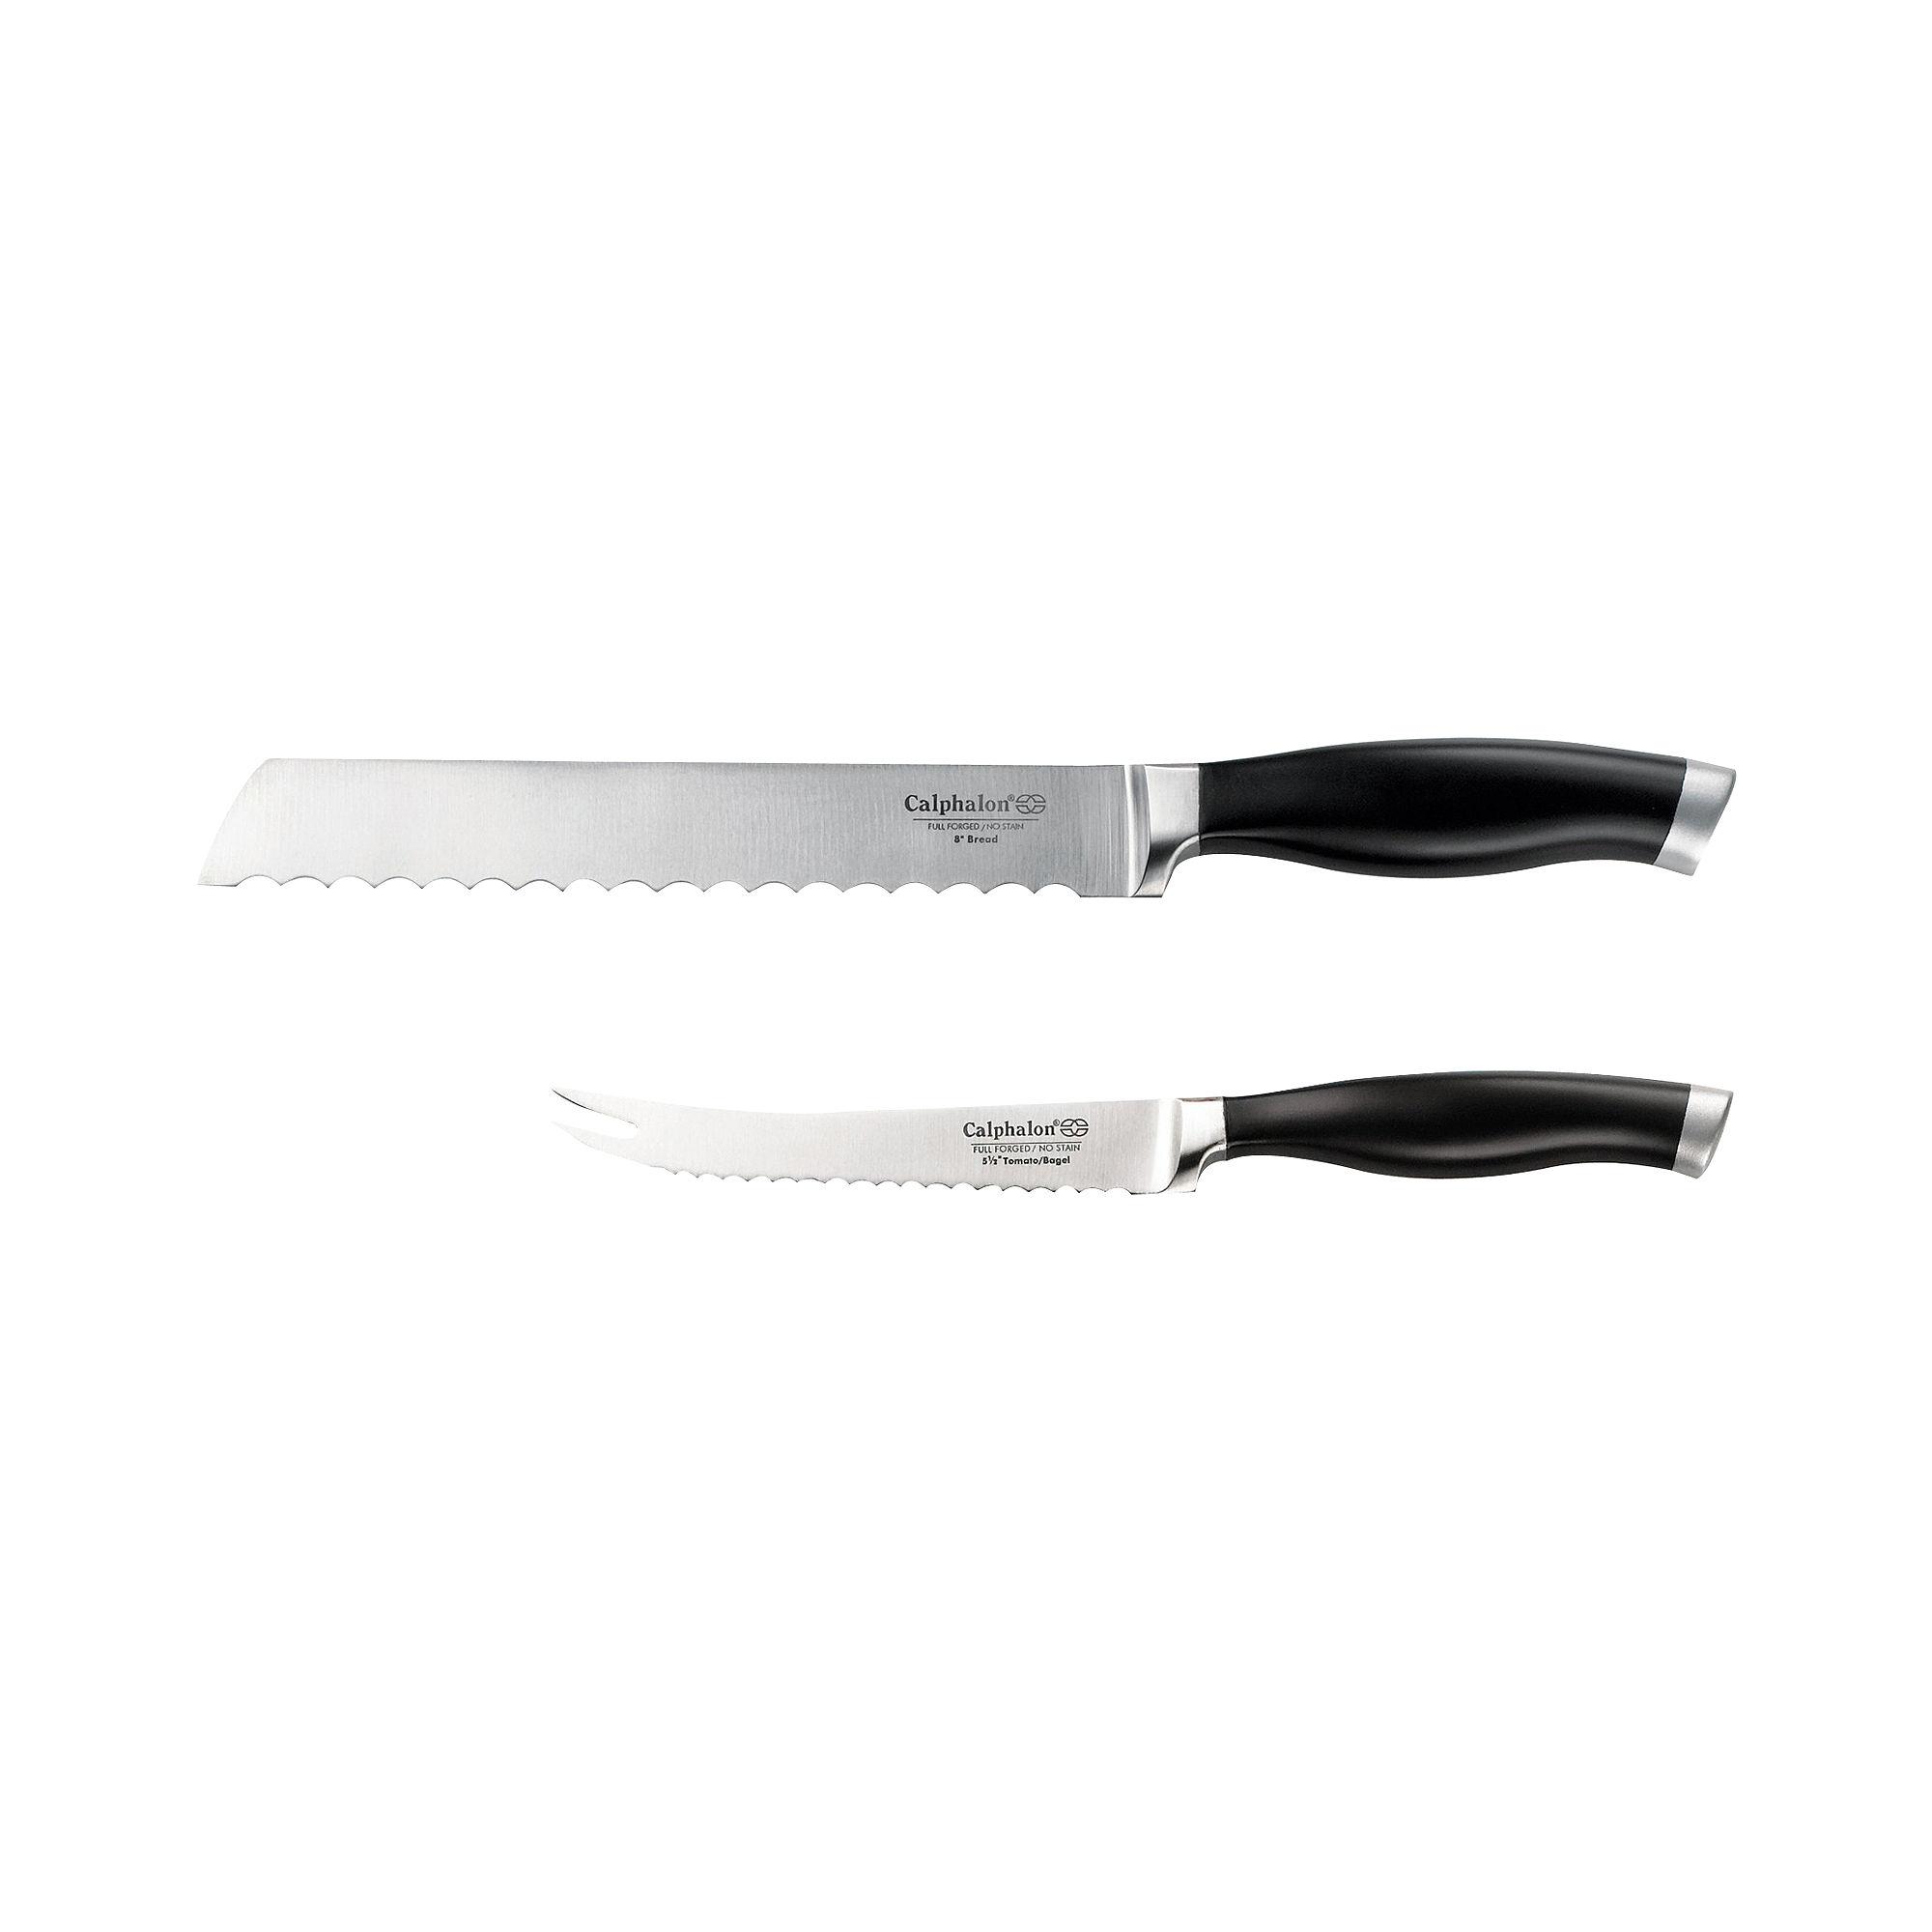 Calphalon Contemporary Bread & Bagel/Tomato Knife Set